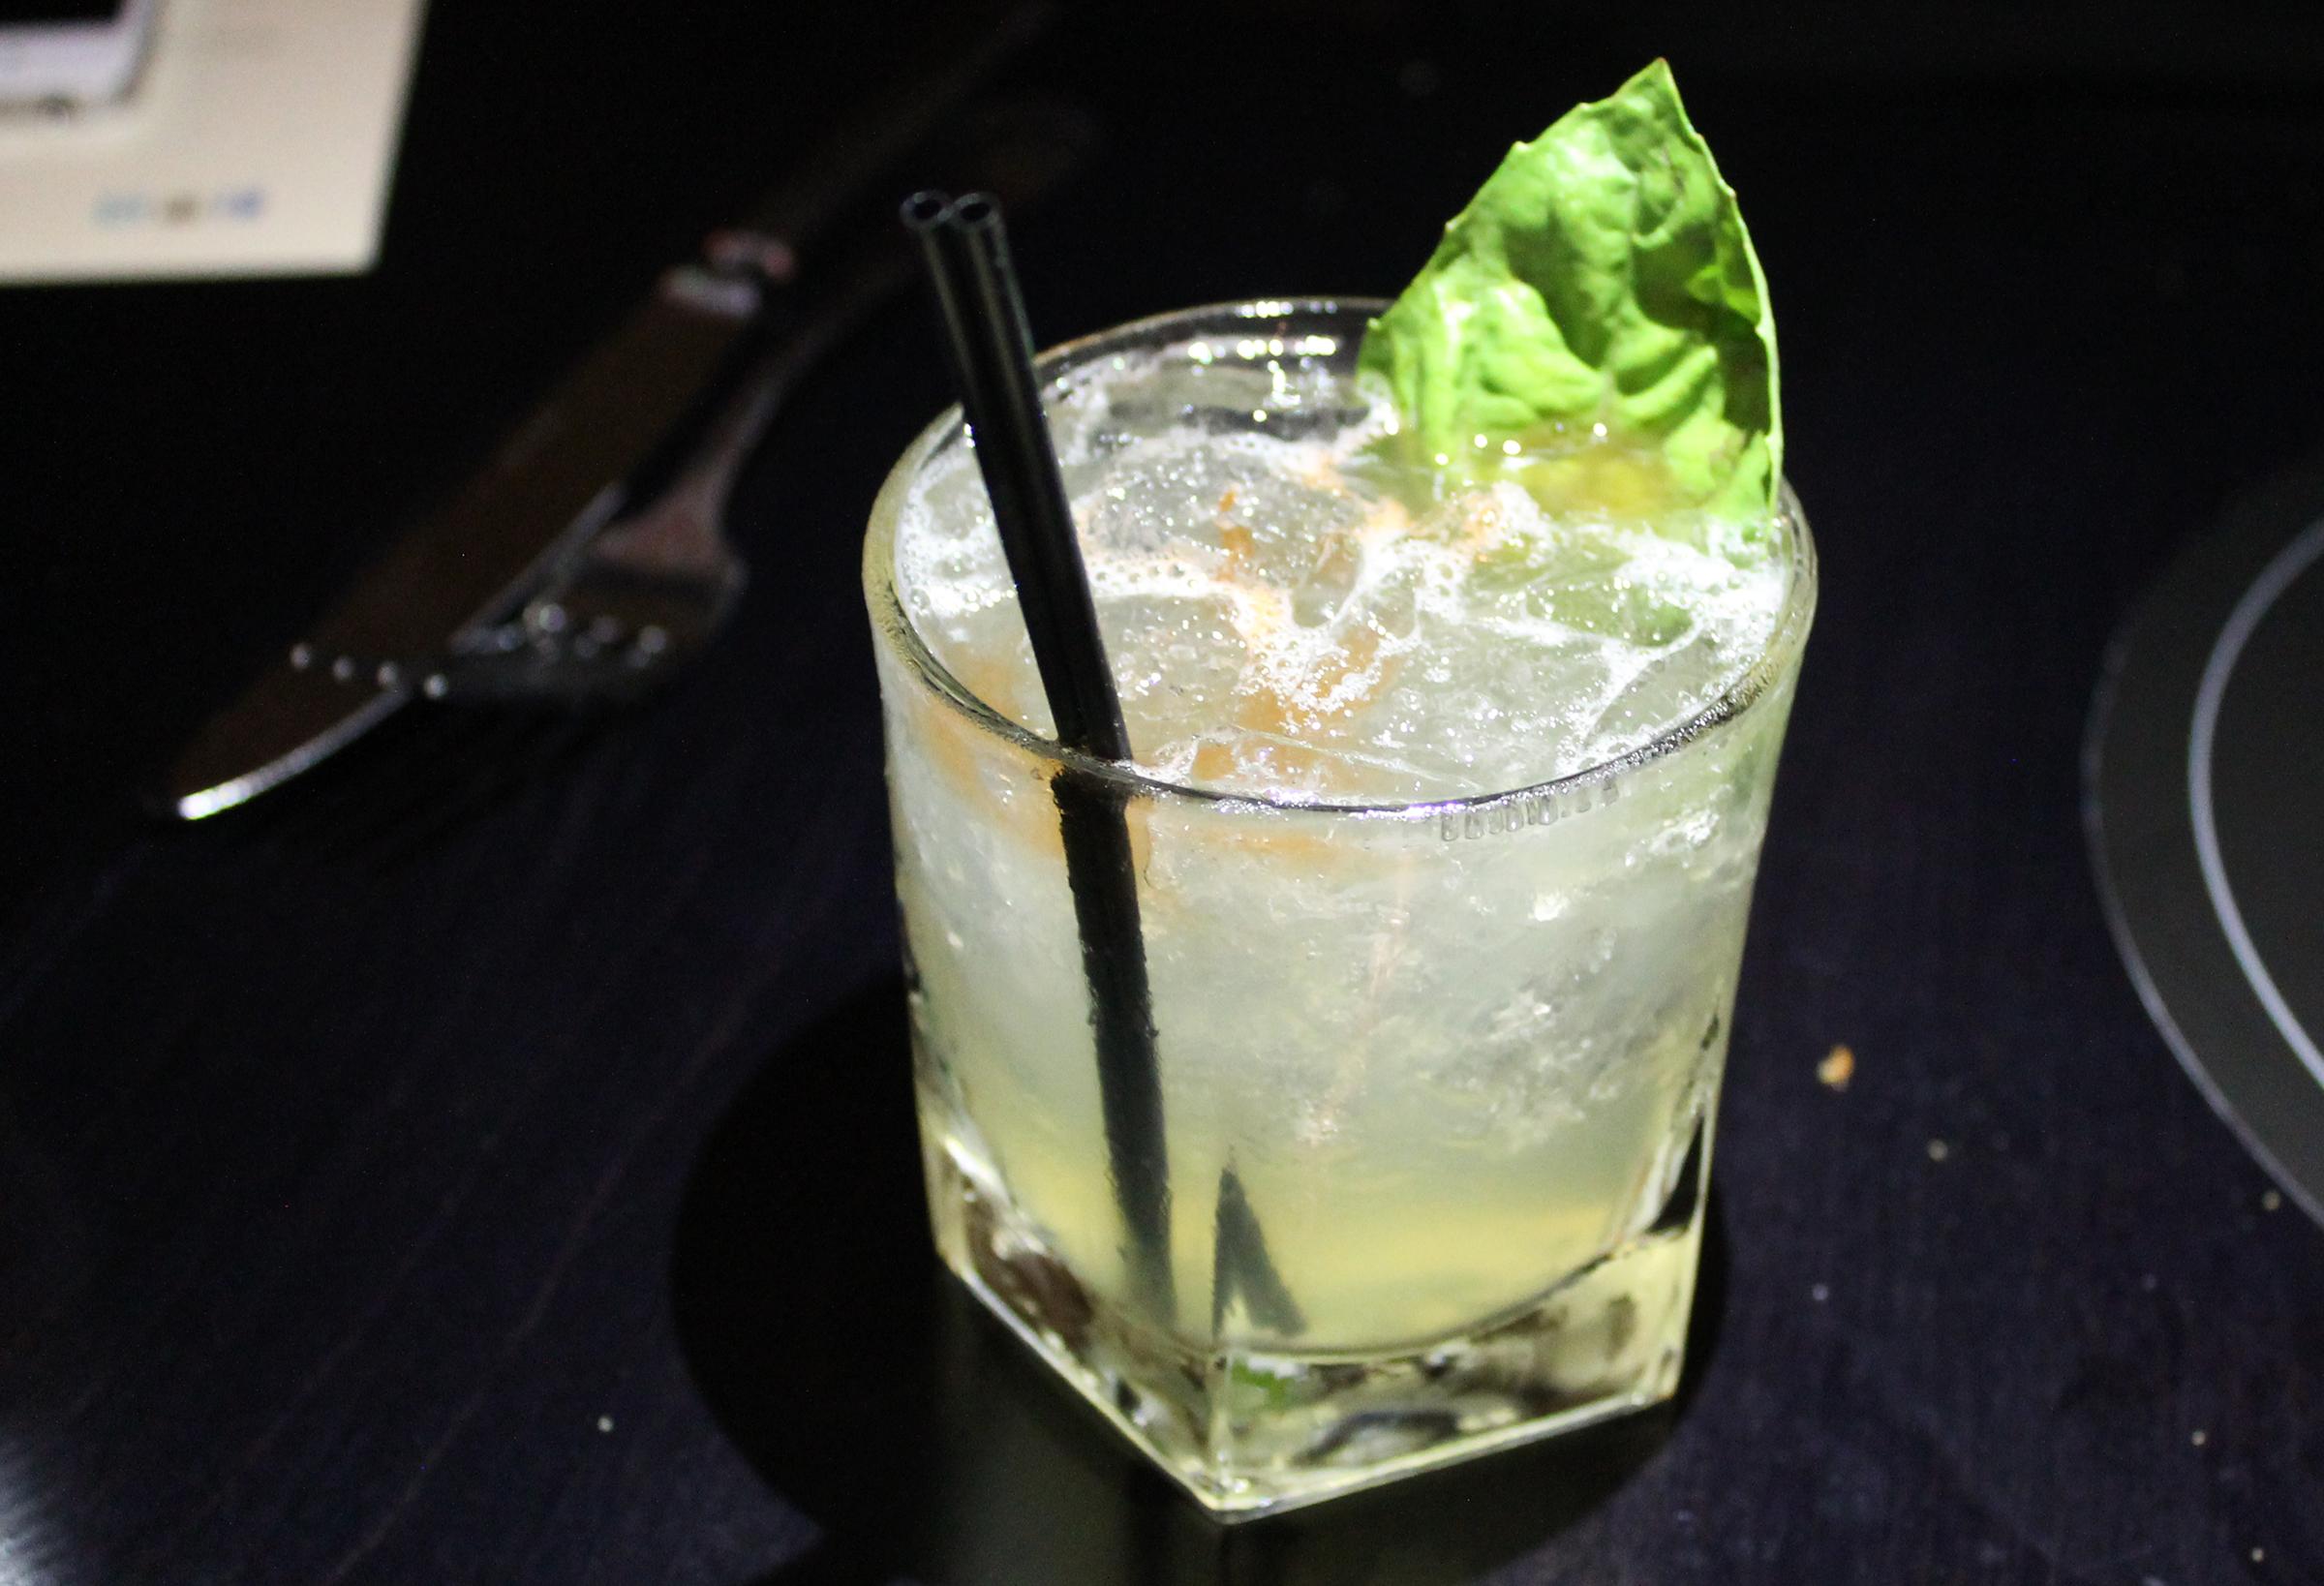 Le Pastel:  Hendricks, Fresh Lemon, Lime & Grapefruit Juice